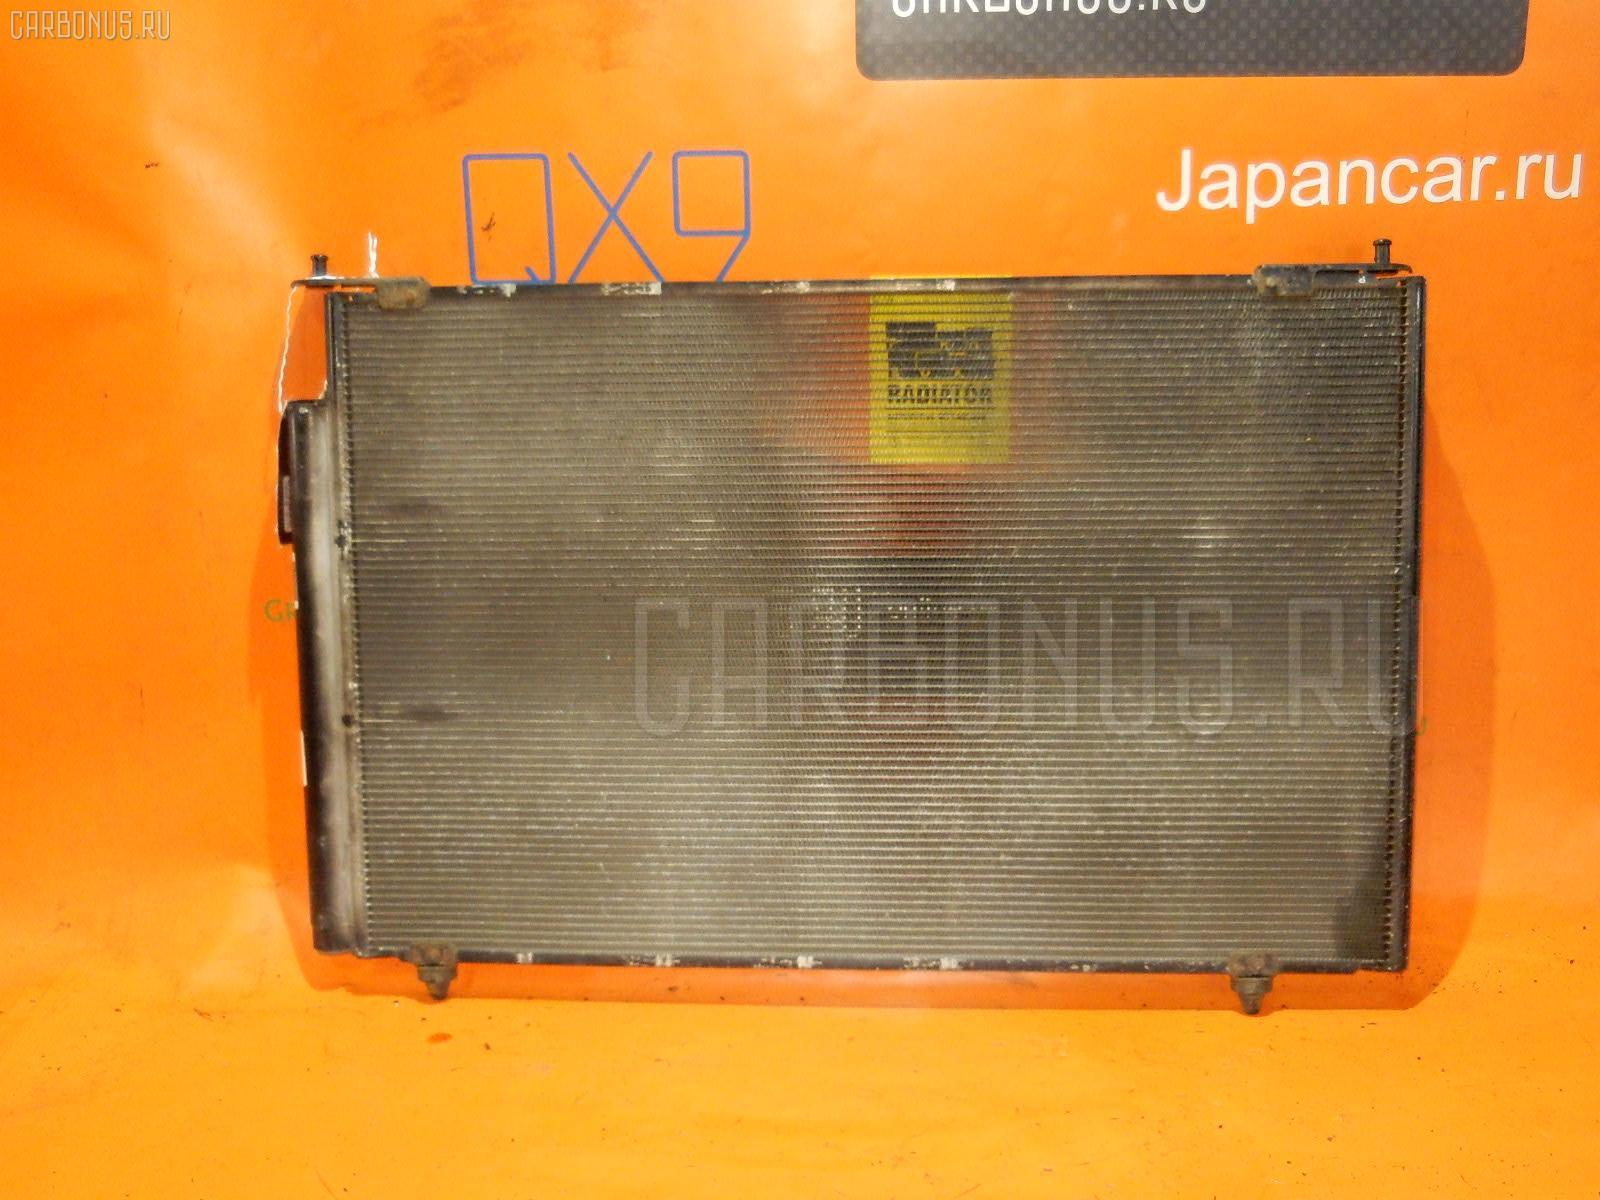 Радиатор кондиционера TOYOTA VOXY ZRR70G 3ZR-FAE Фото 2